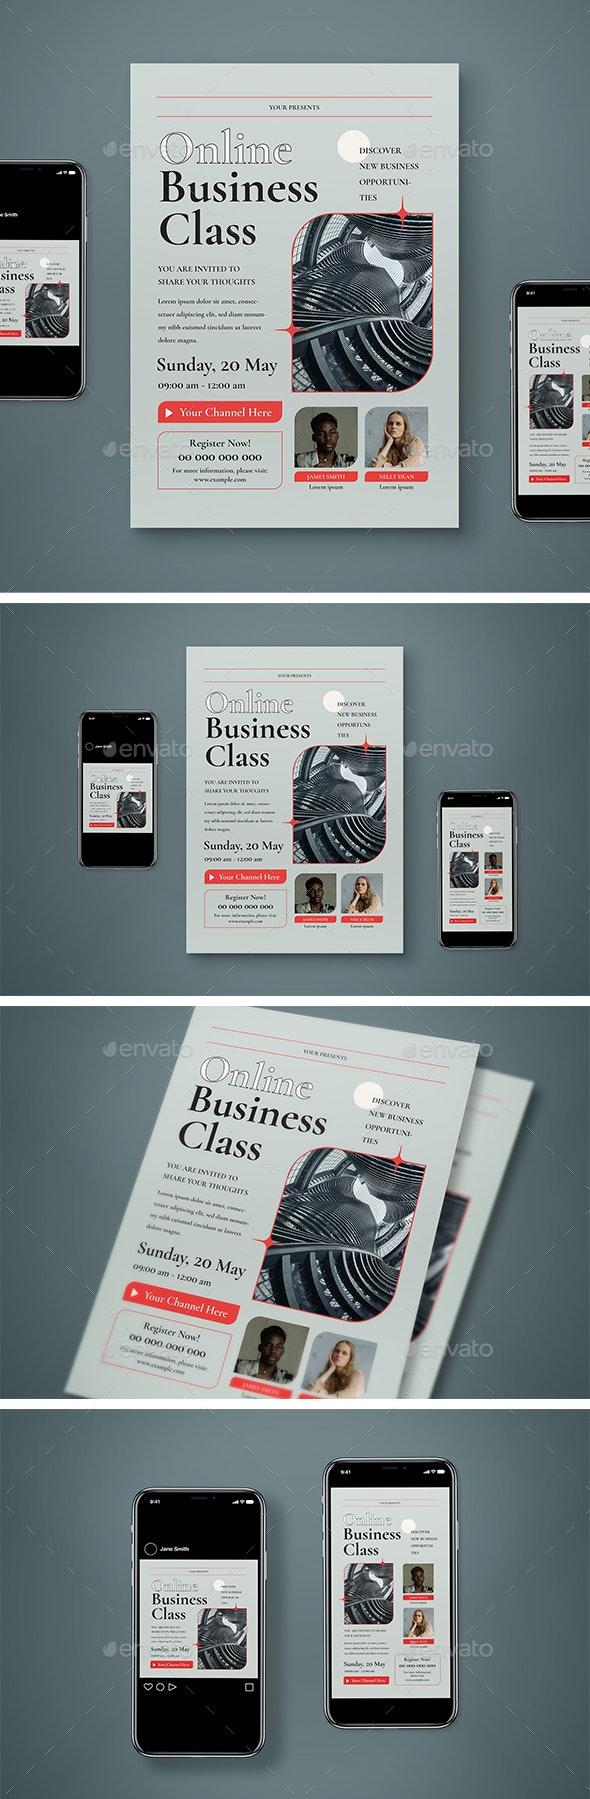 Online Business Class Flyer Set - Flyers Print Templates